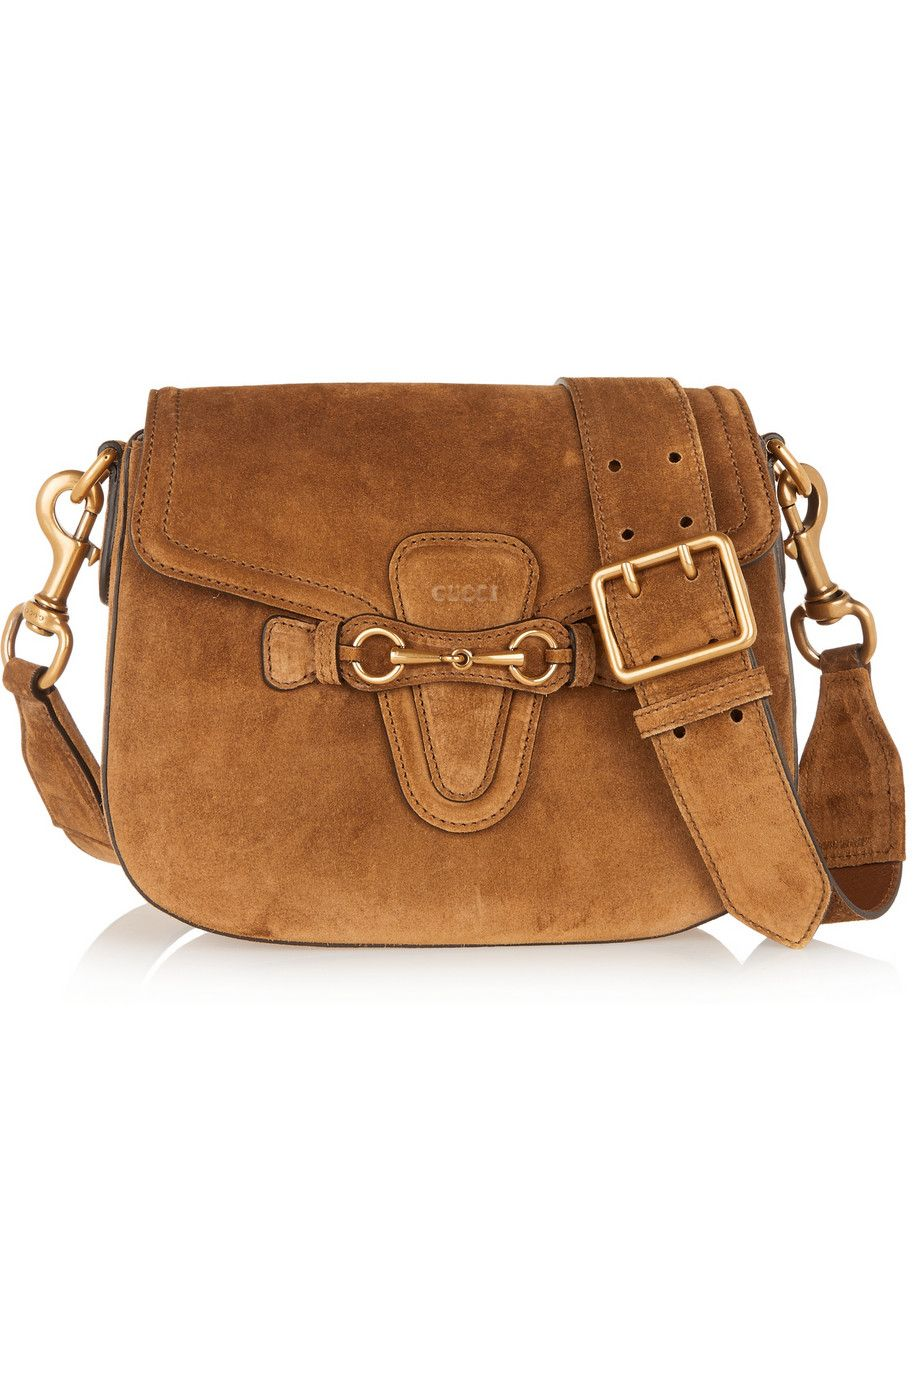 9d03cc3b098c17 Gucci | Lady Web medium suede shoulder bag | wish list | Bags ...